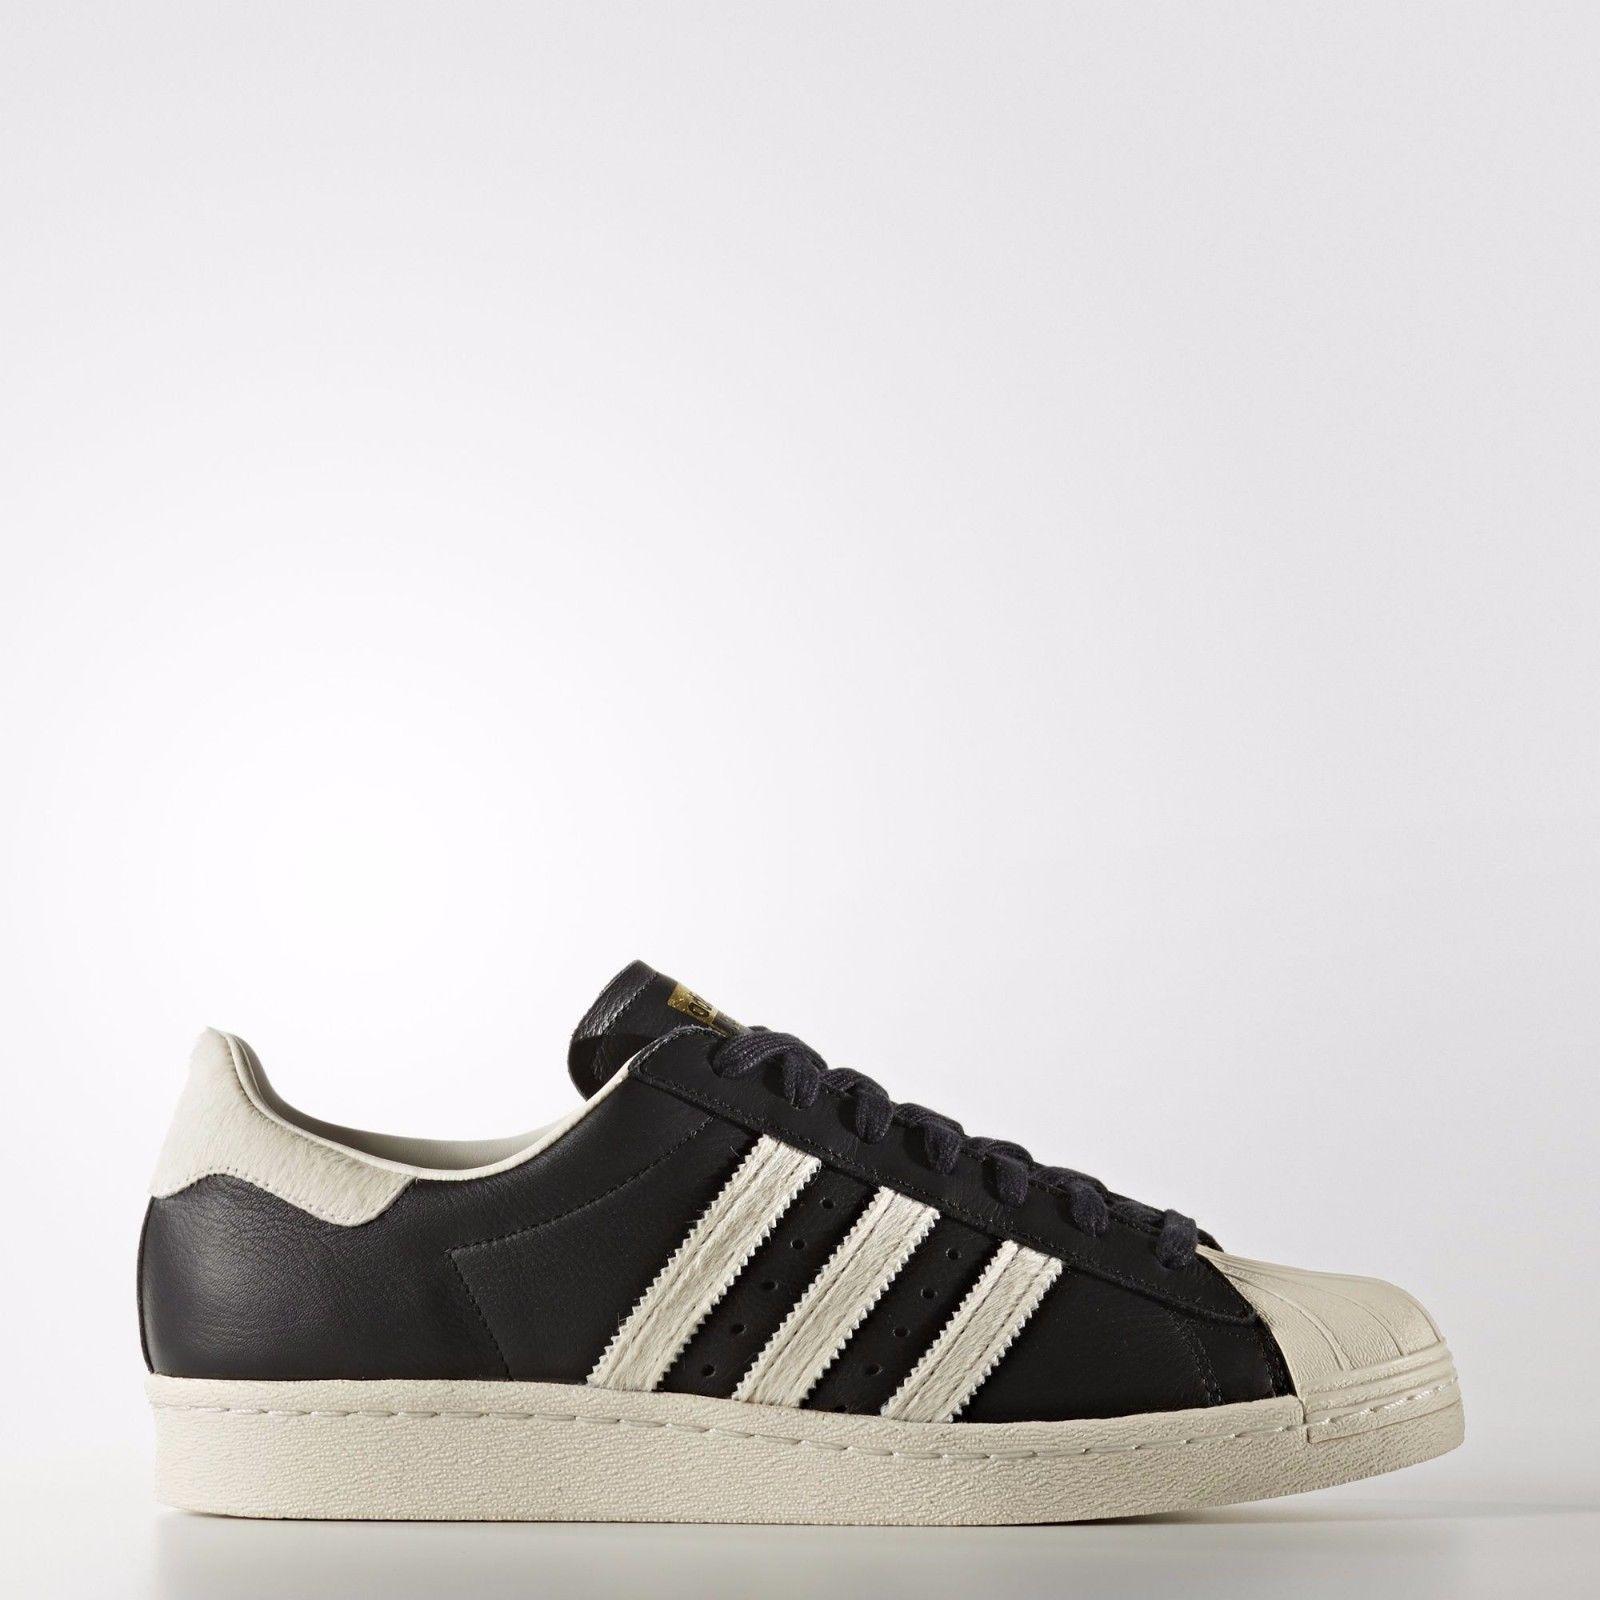 80s Originale Uomo Pelle Bb2232 Scarpe Adidas Sneakers Superstar PXqxtzZzw